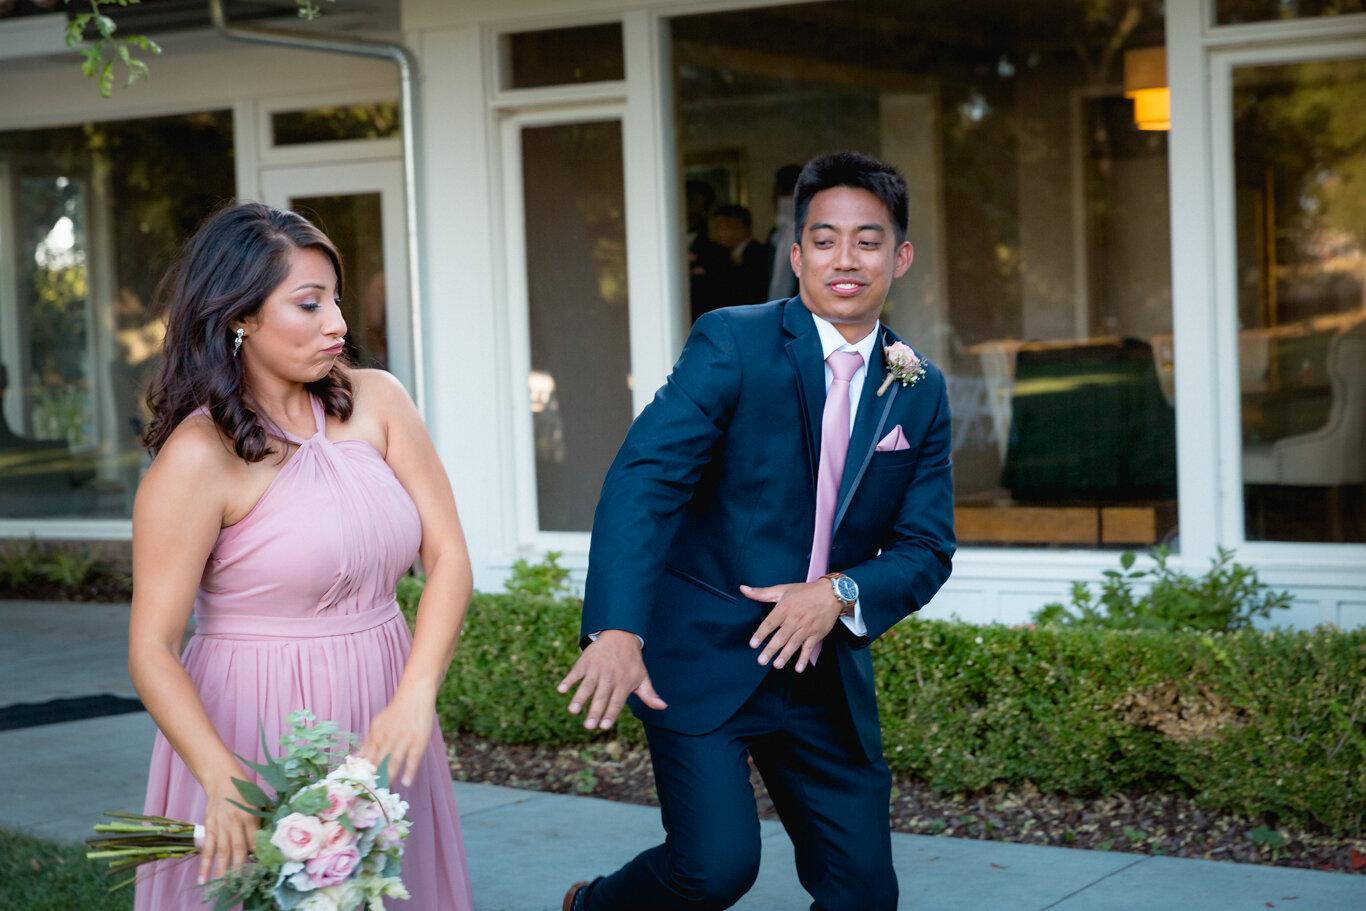 2019.08.24_Emily-Ashir-Wedding-at-the-Maples-6139.jpg